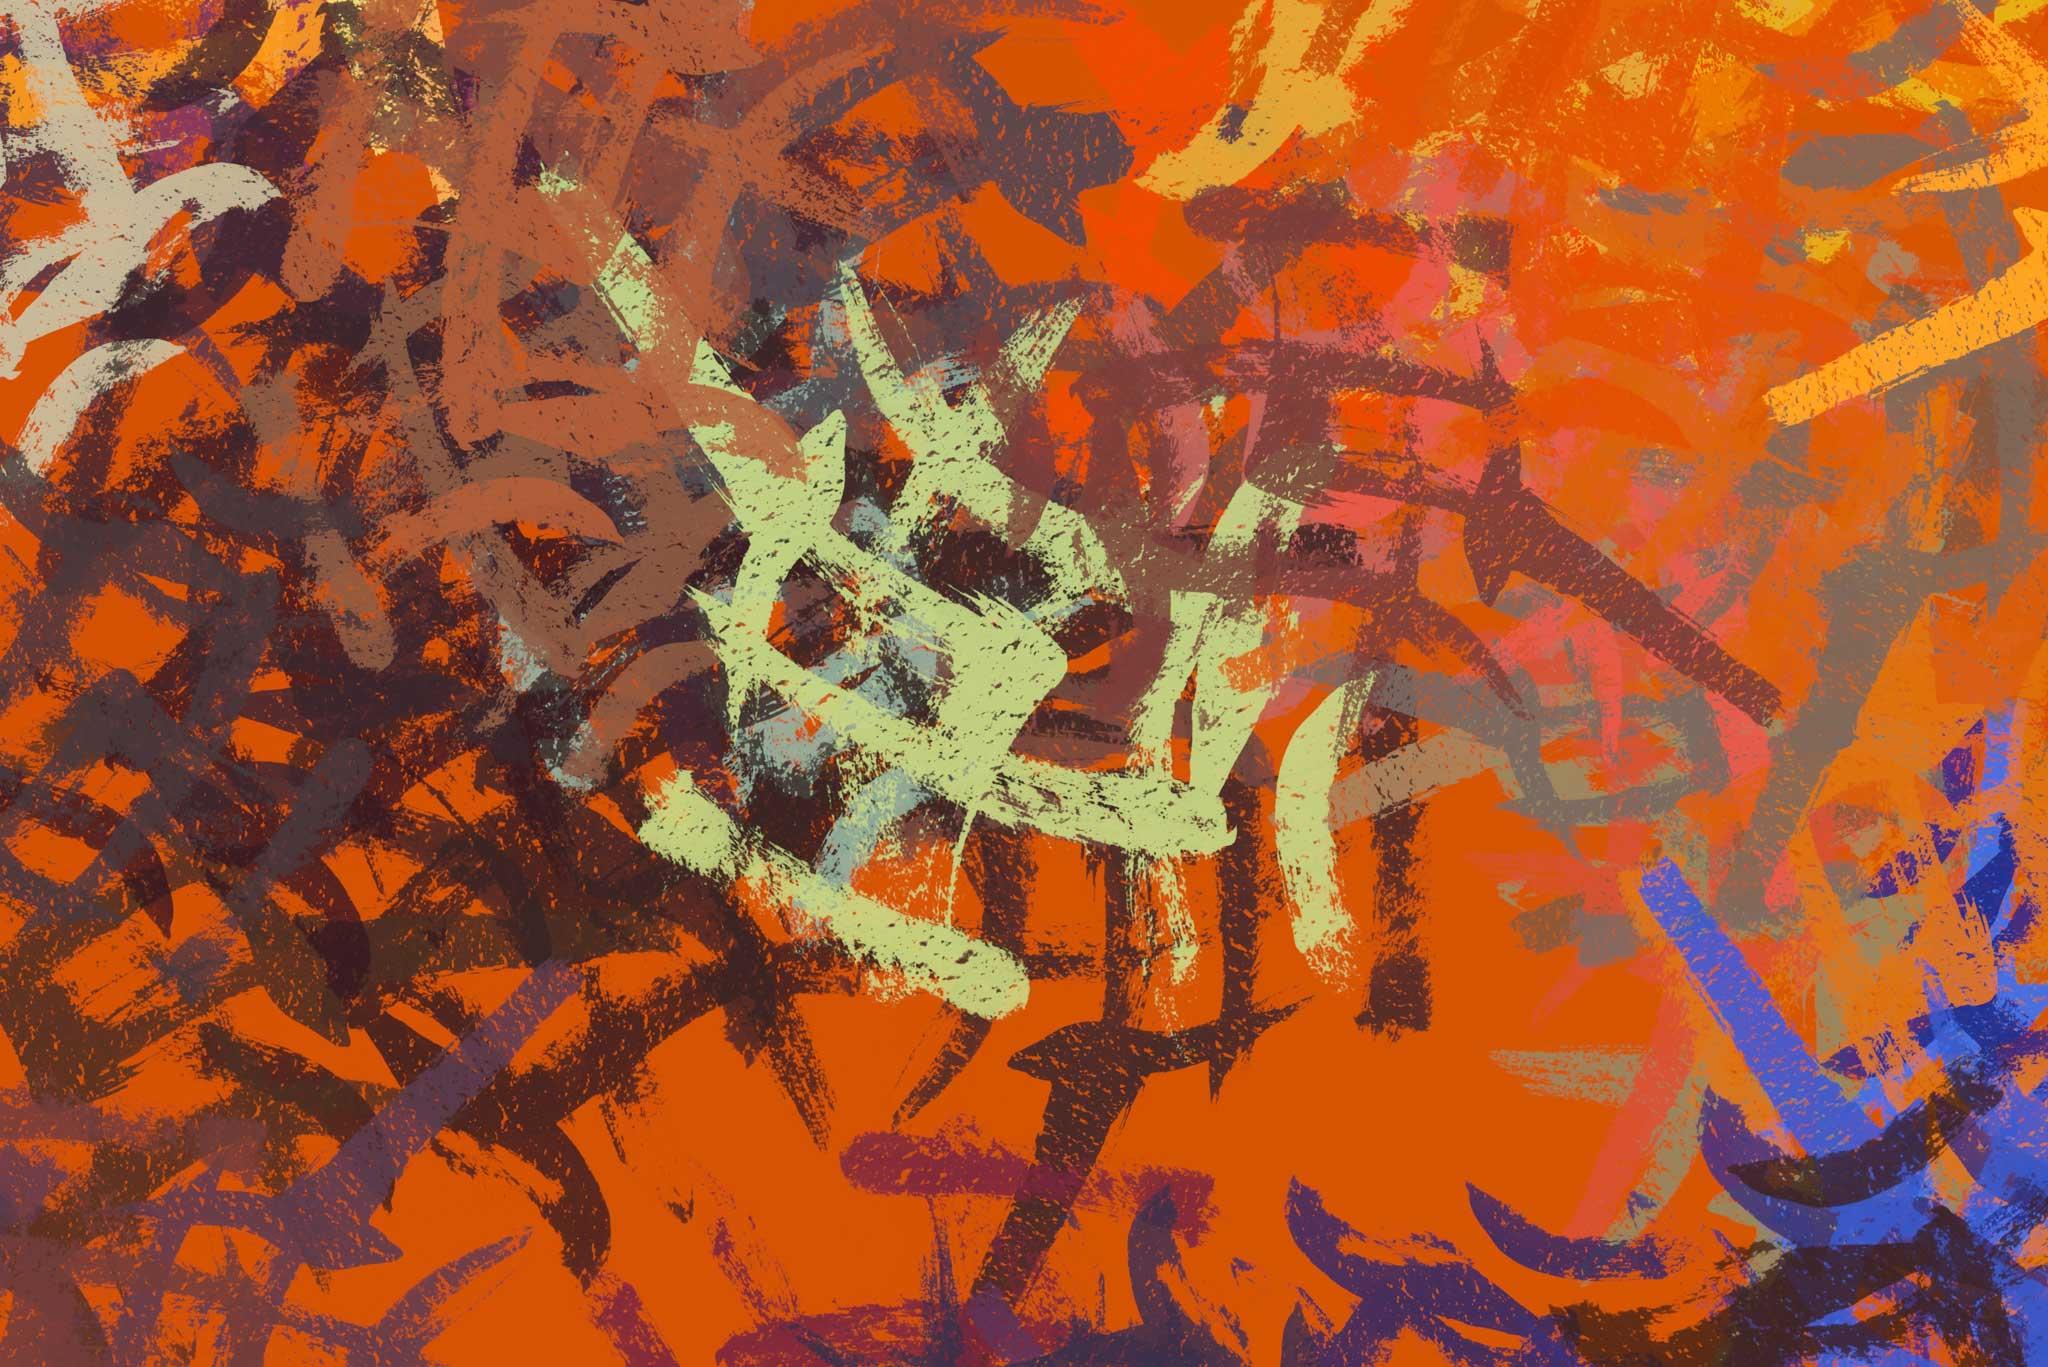 tapet-fototapet-design-decor-mural-customizabil-comanda-personalizat-bucuresti-daring-prints-motiv-model-pictura-contemporana-abstracta-tuse-pensula-culoare-rosu